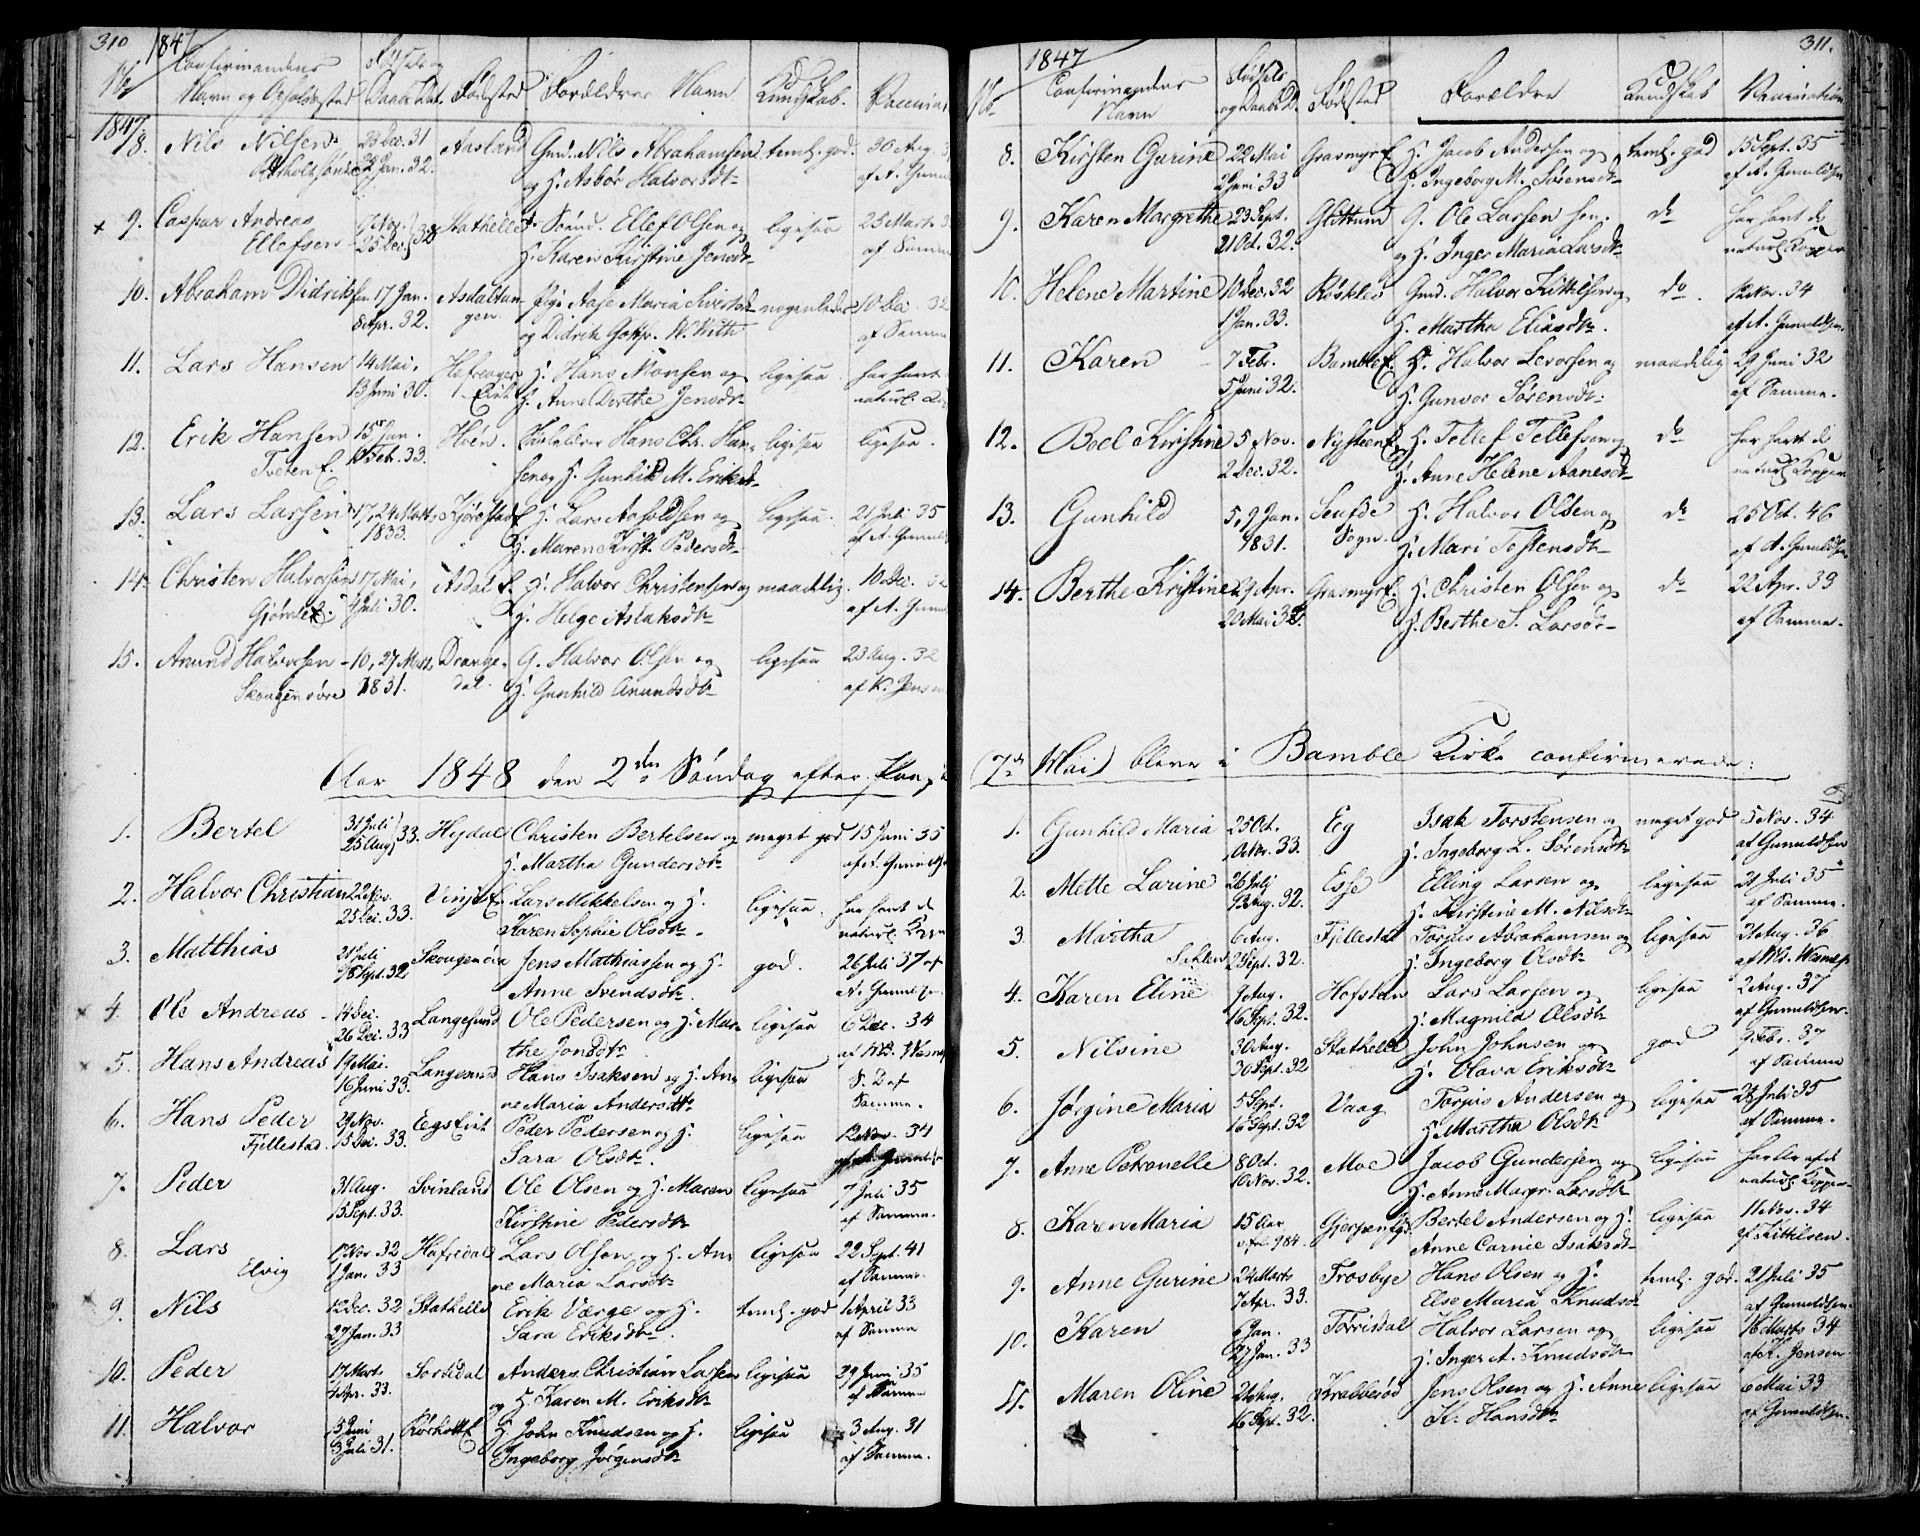 SAKO, Bamble kirkebøker, F/Fa/L0004: Ministerialbok nr. I 4, 1834-1853, s. 310-311